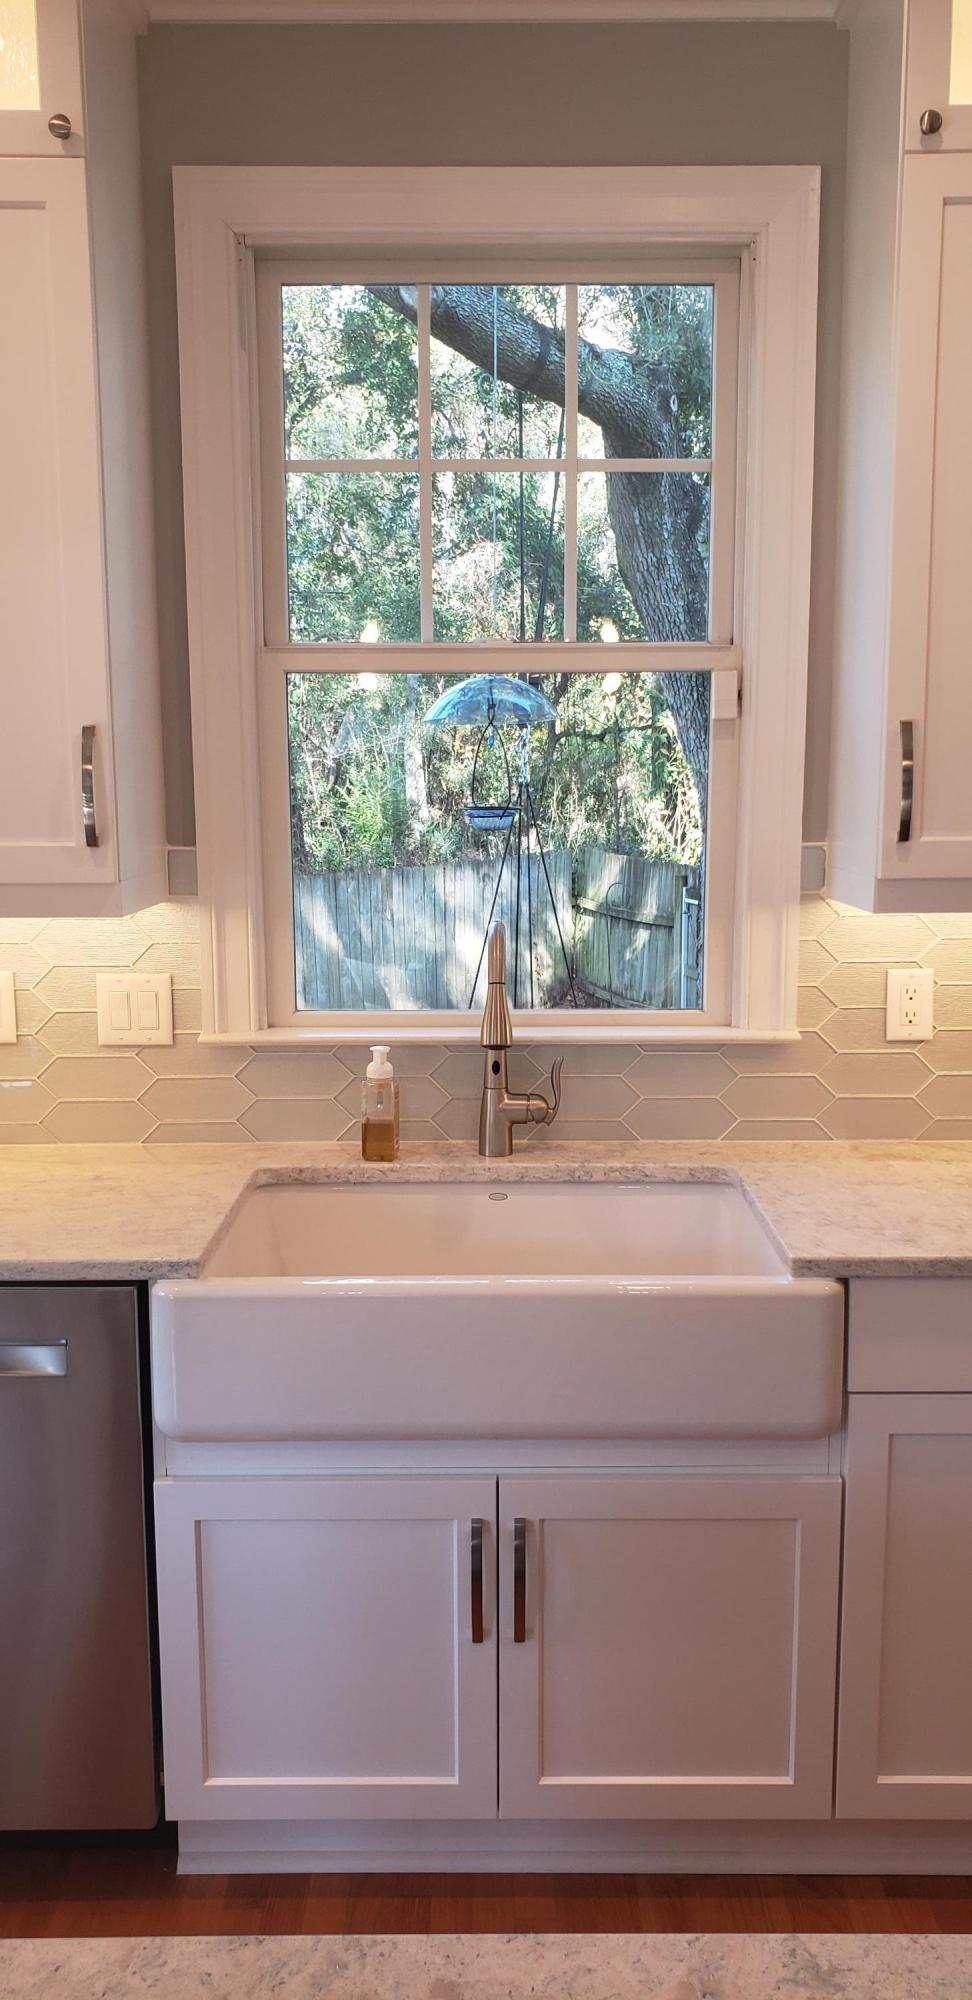 Laurel Lakes Homes For Sale - 1305 Woodlock, Mount Pleasant, SC - 5